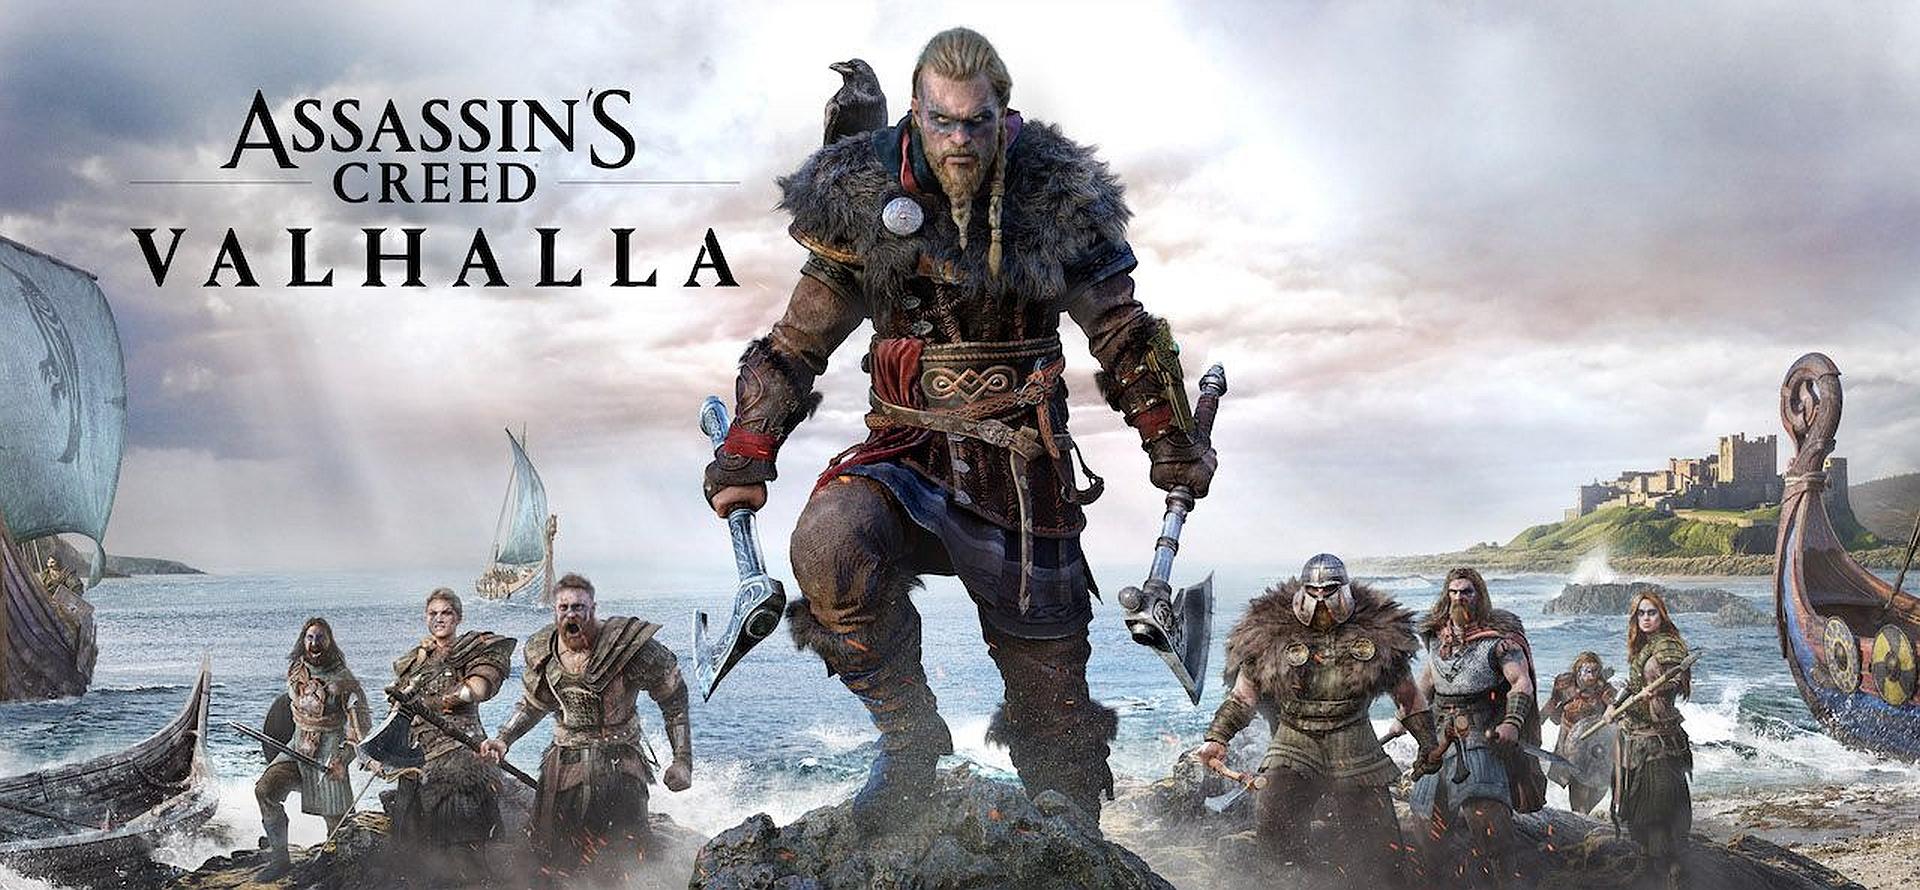 Игра Assassin's Creed Valhalla